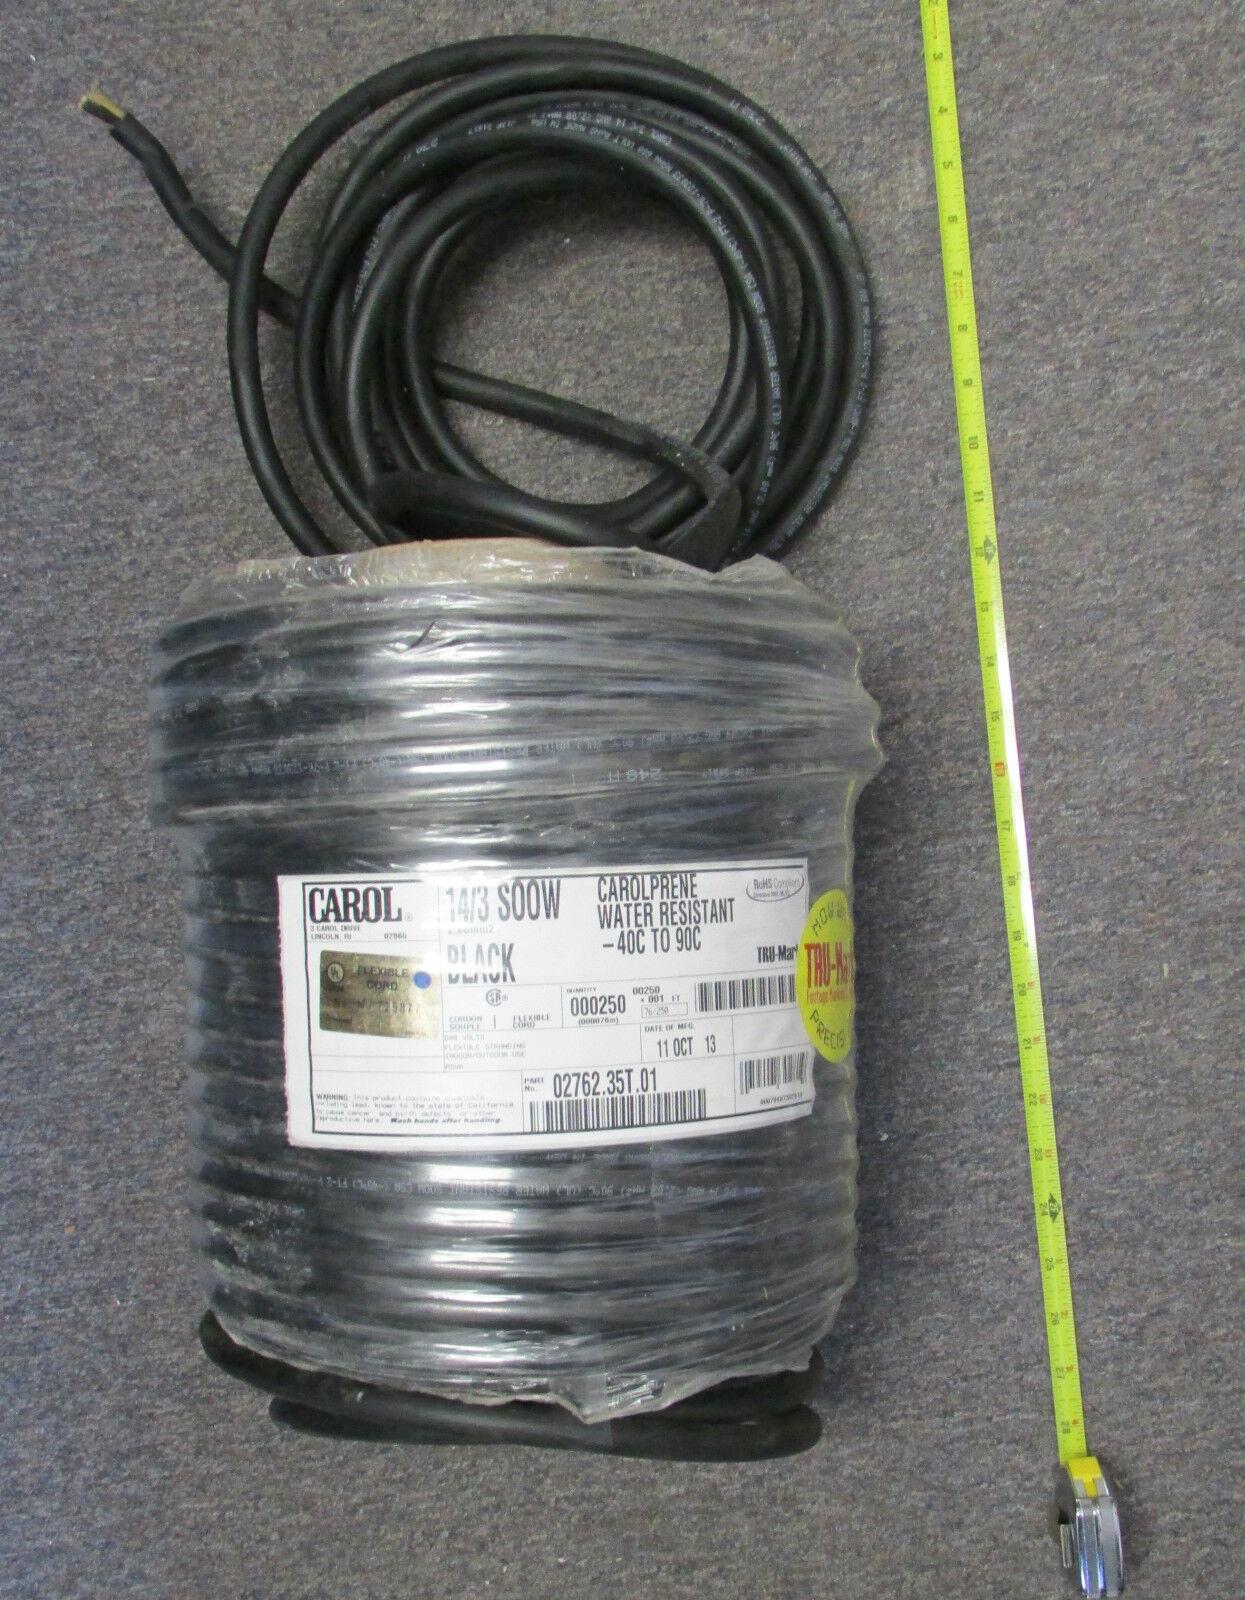 1) Roll Carol 14/3 S00w 2.08mm2 250 FT Black Carolprene Water ...